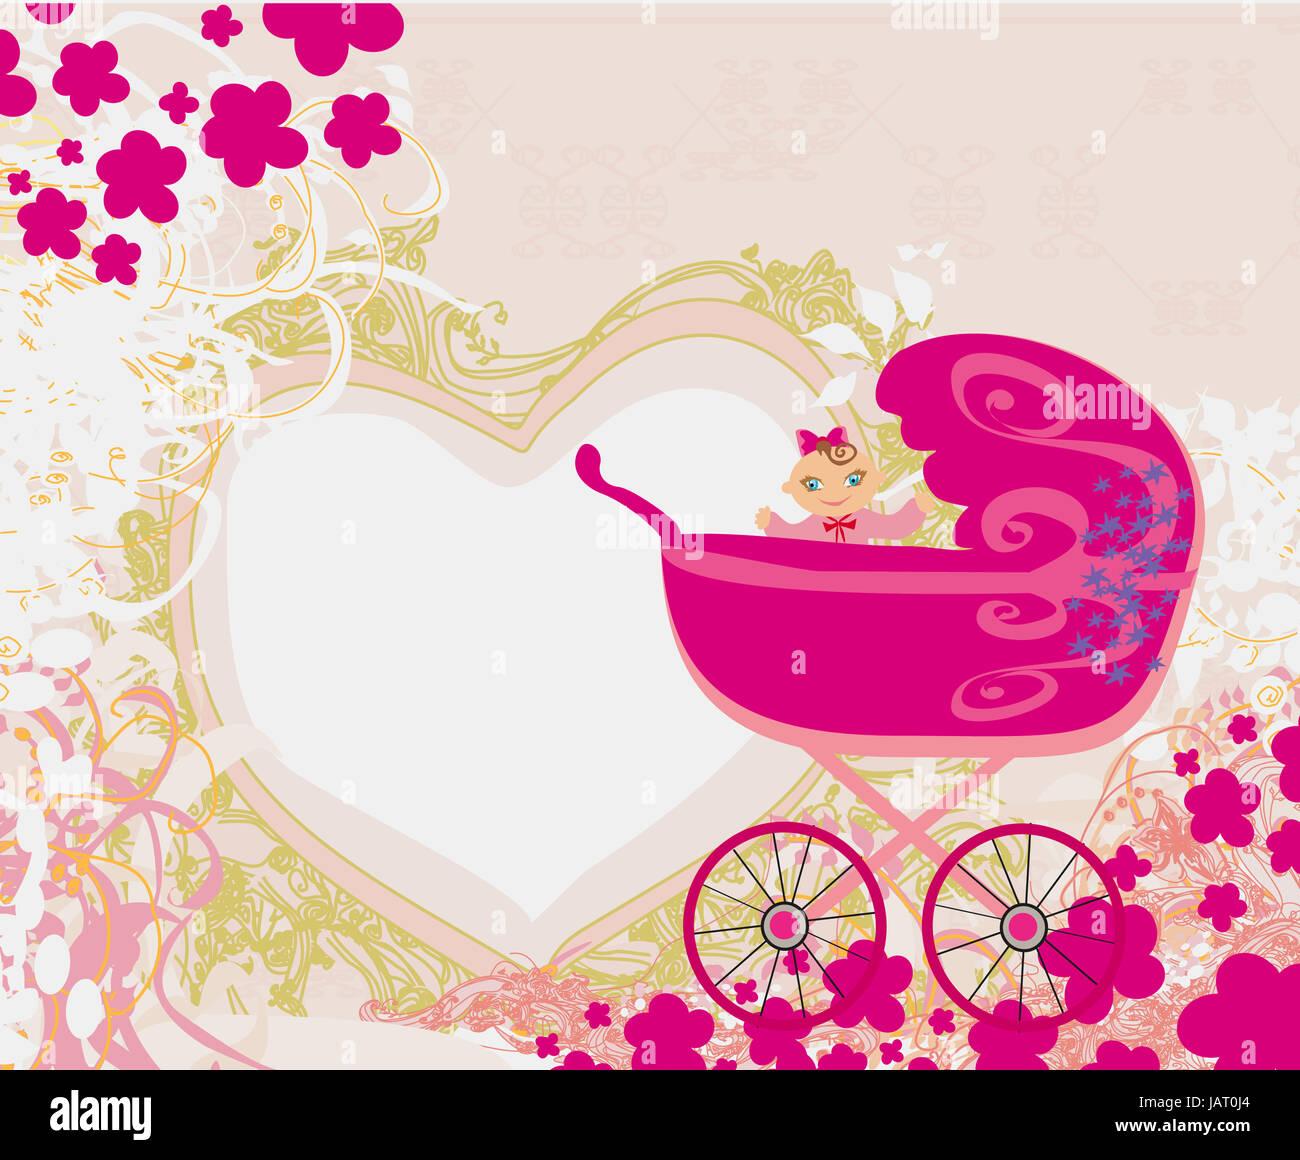 Baby Mädchen Ankündigung Karte Stockfoto, Bild: 144356860 - Alamy